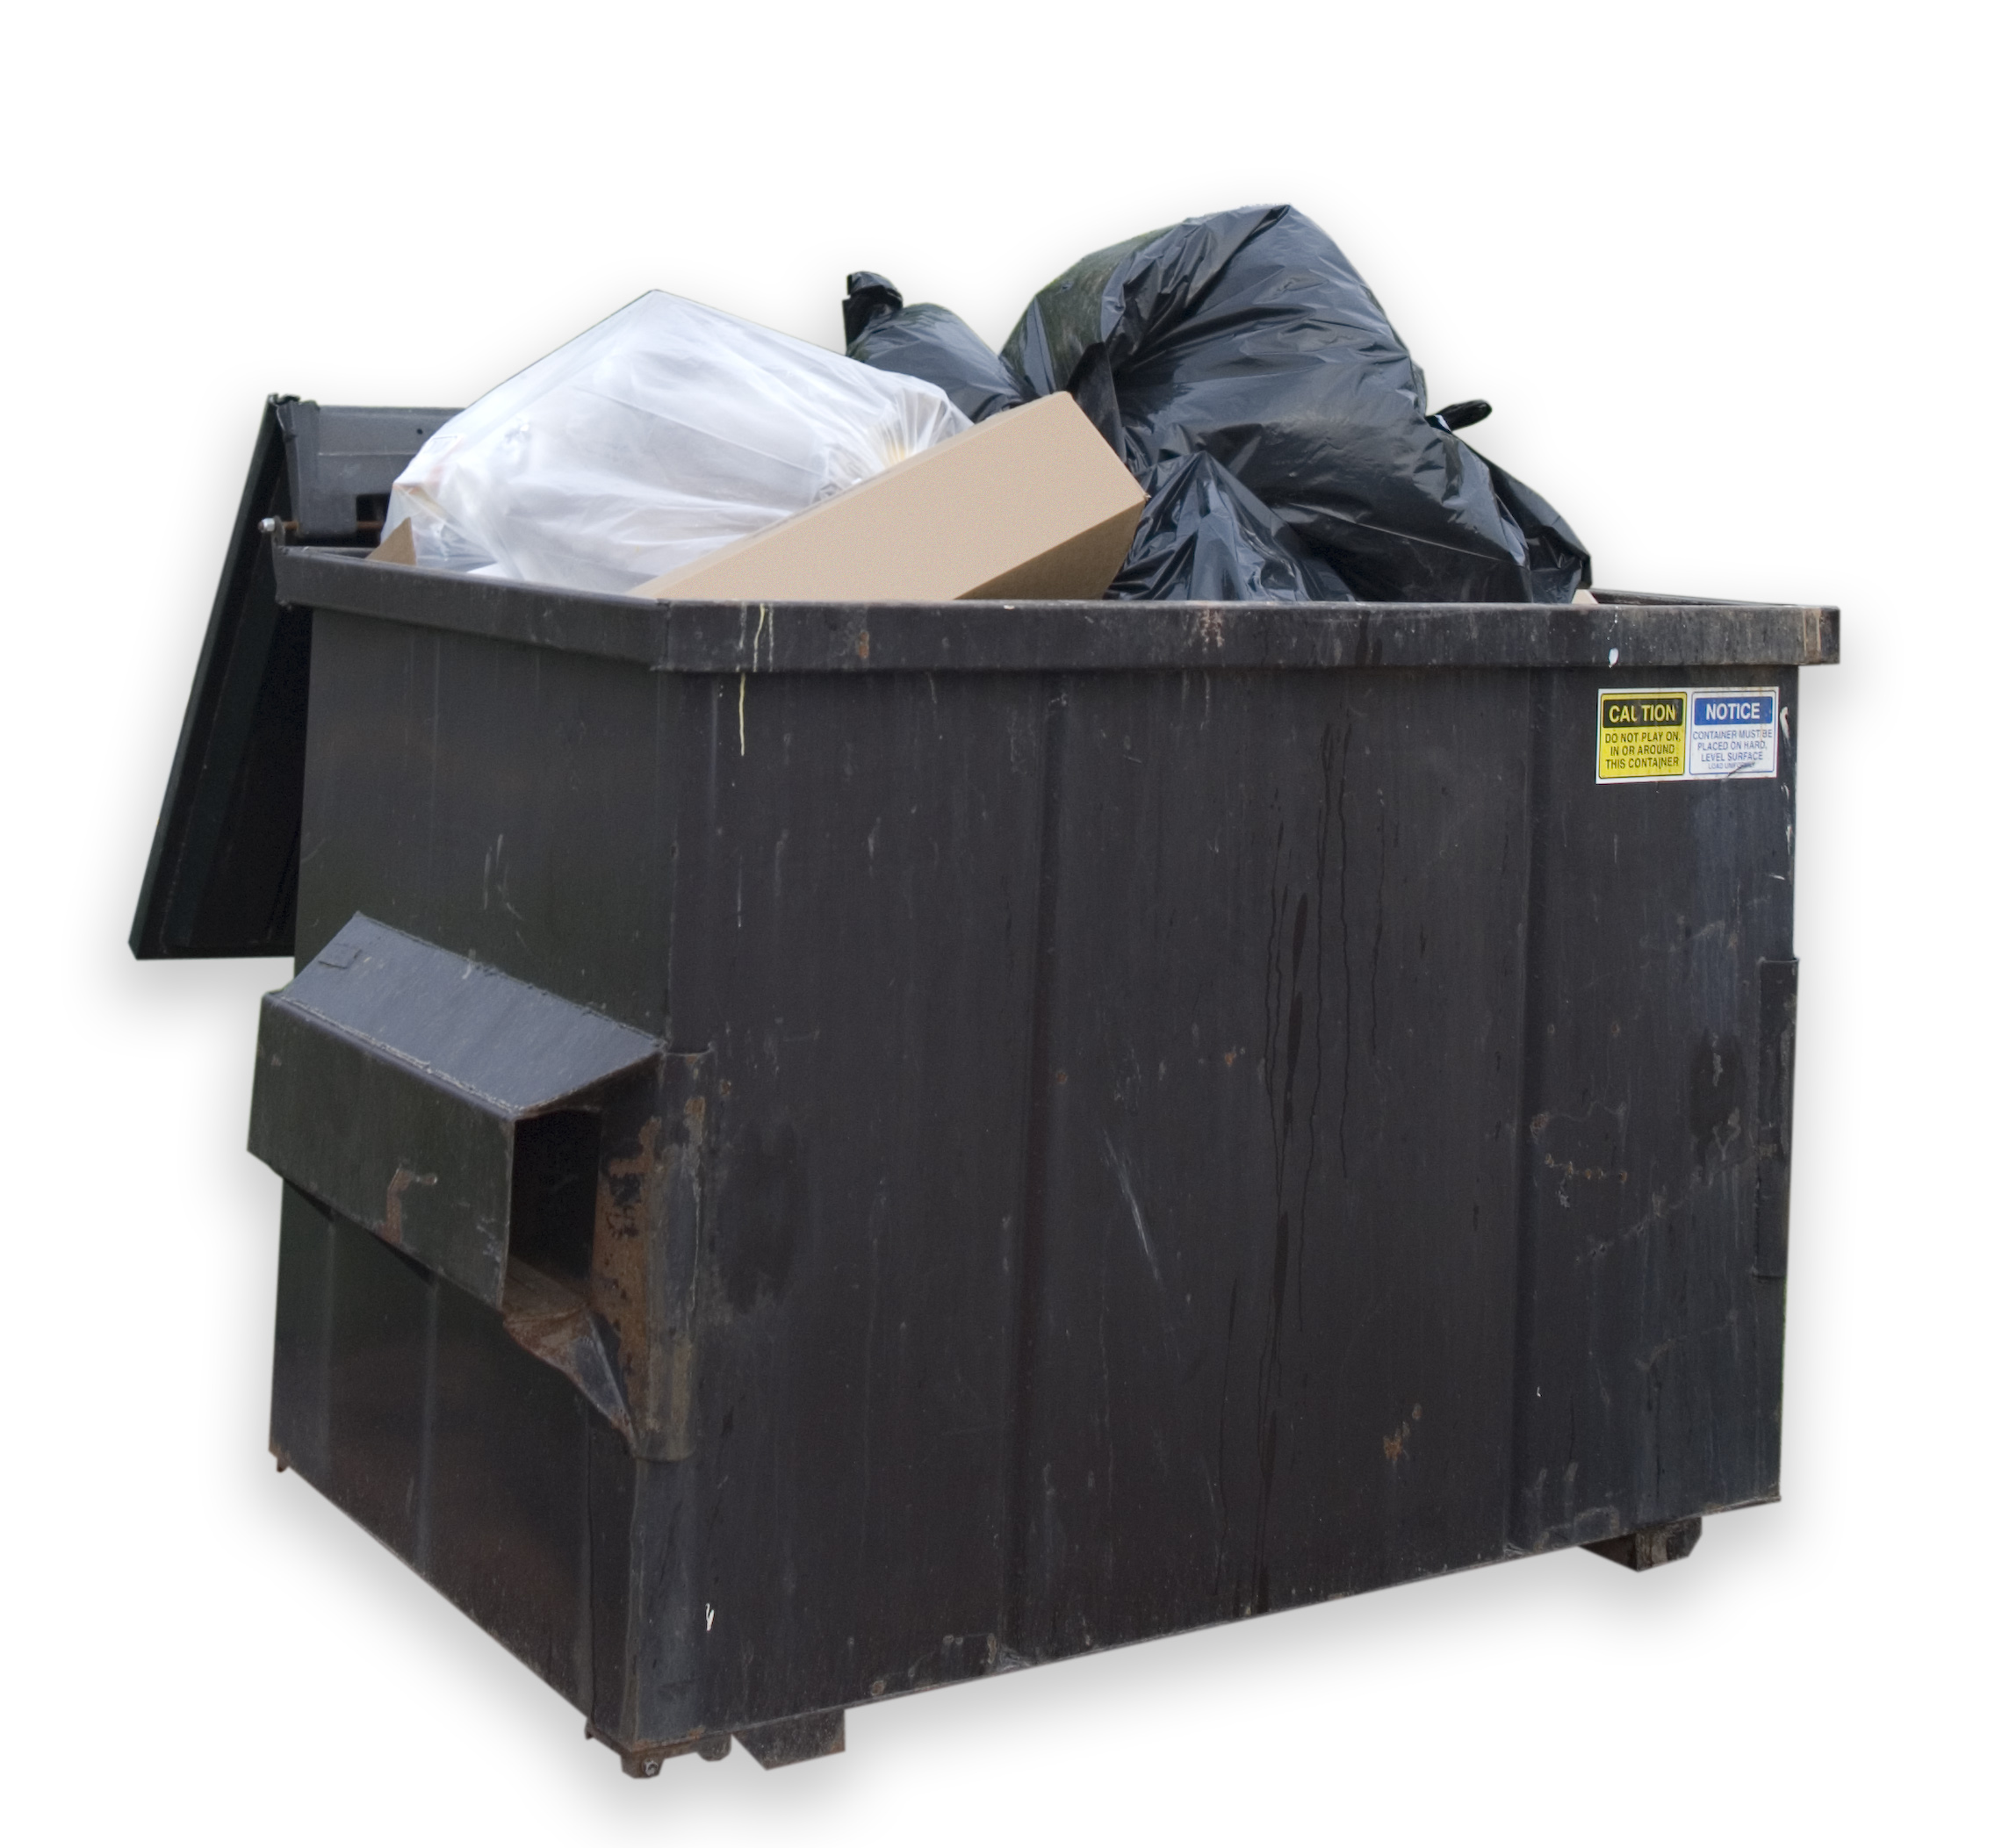 Yard Dumpster Rental Company Discounts Homeowner Dumpster